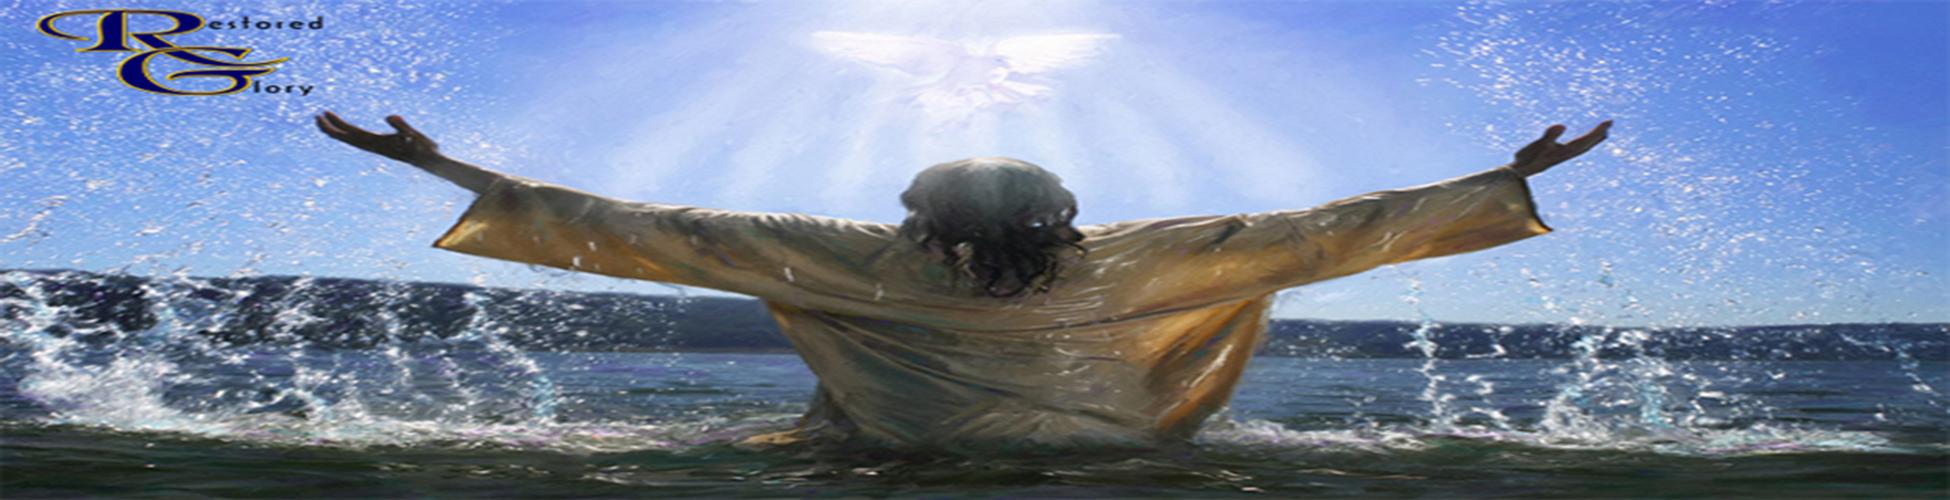 Fall Baptism - Sunday Sept. 24, 10:00 a.m.